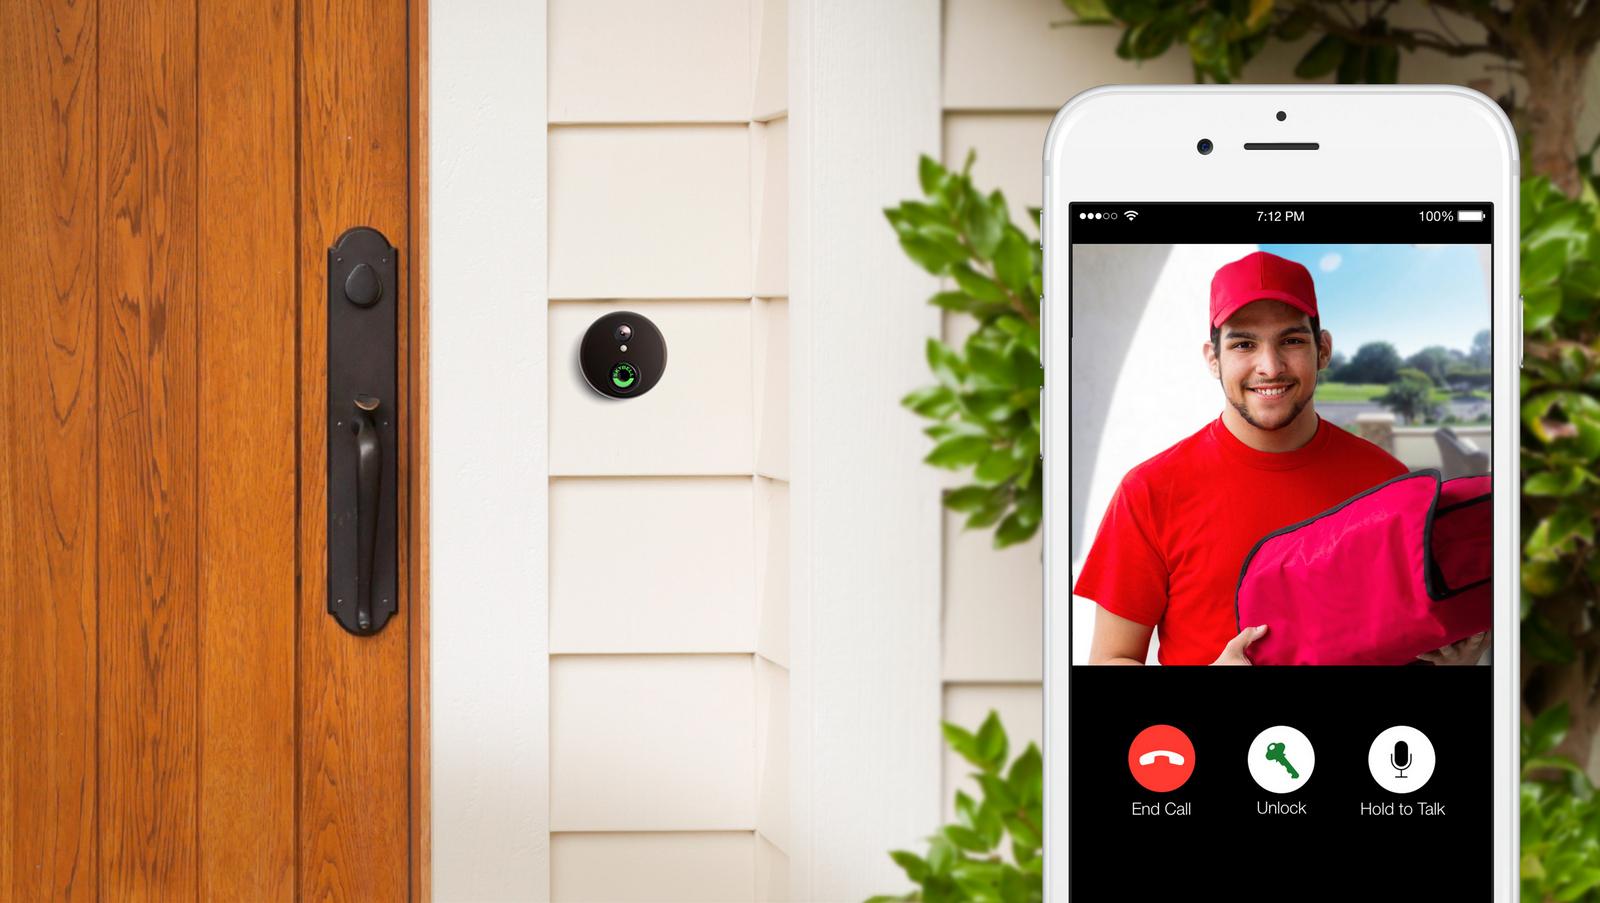 alarm-com-wifi-doorbell-camera